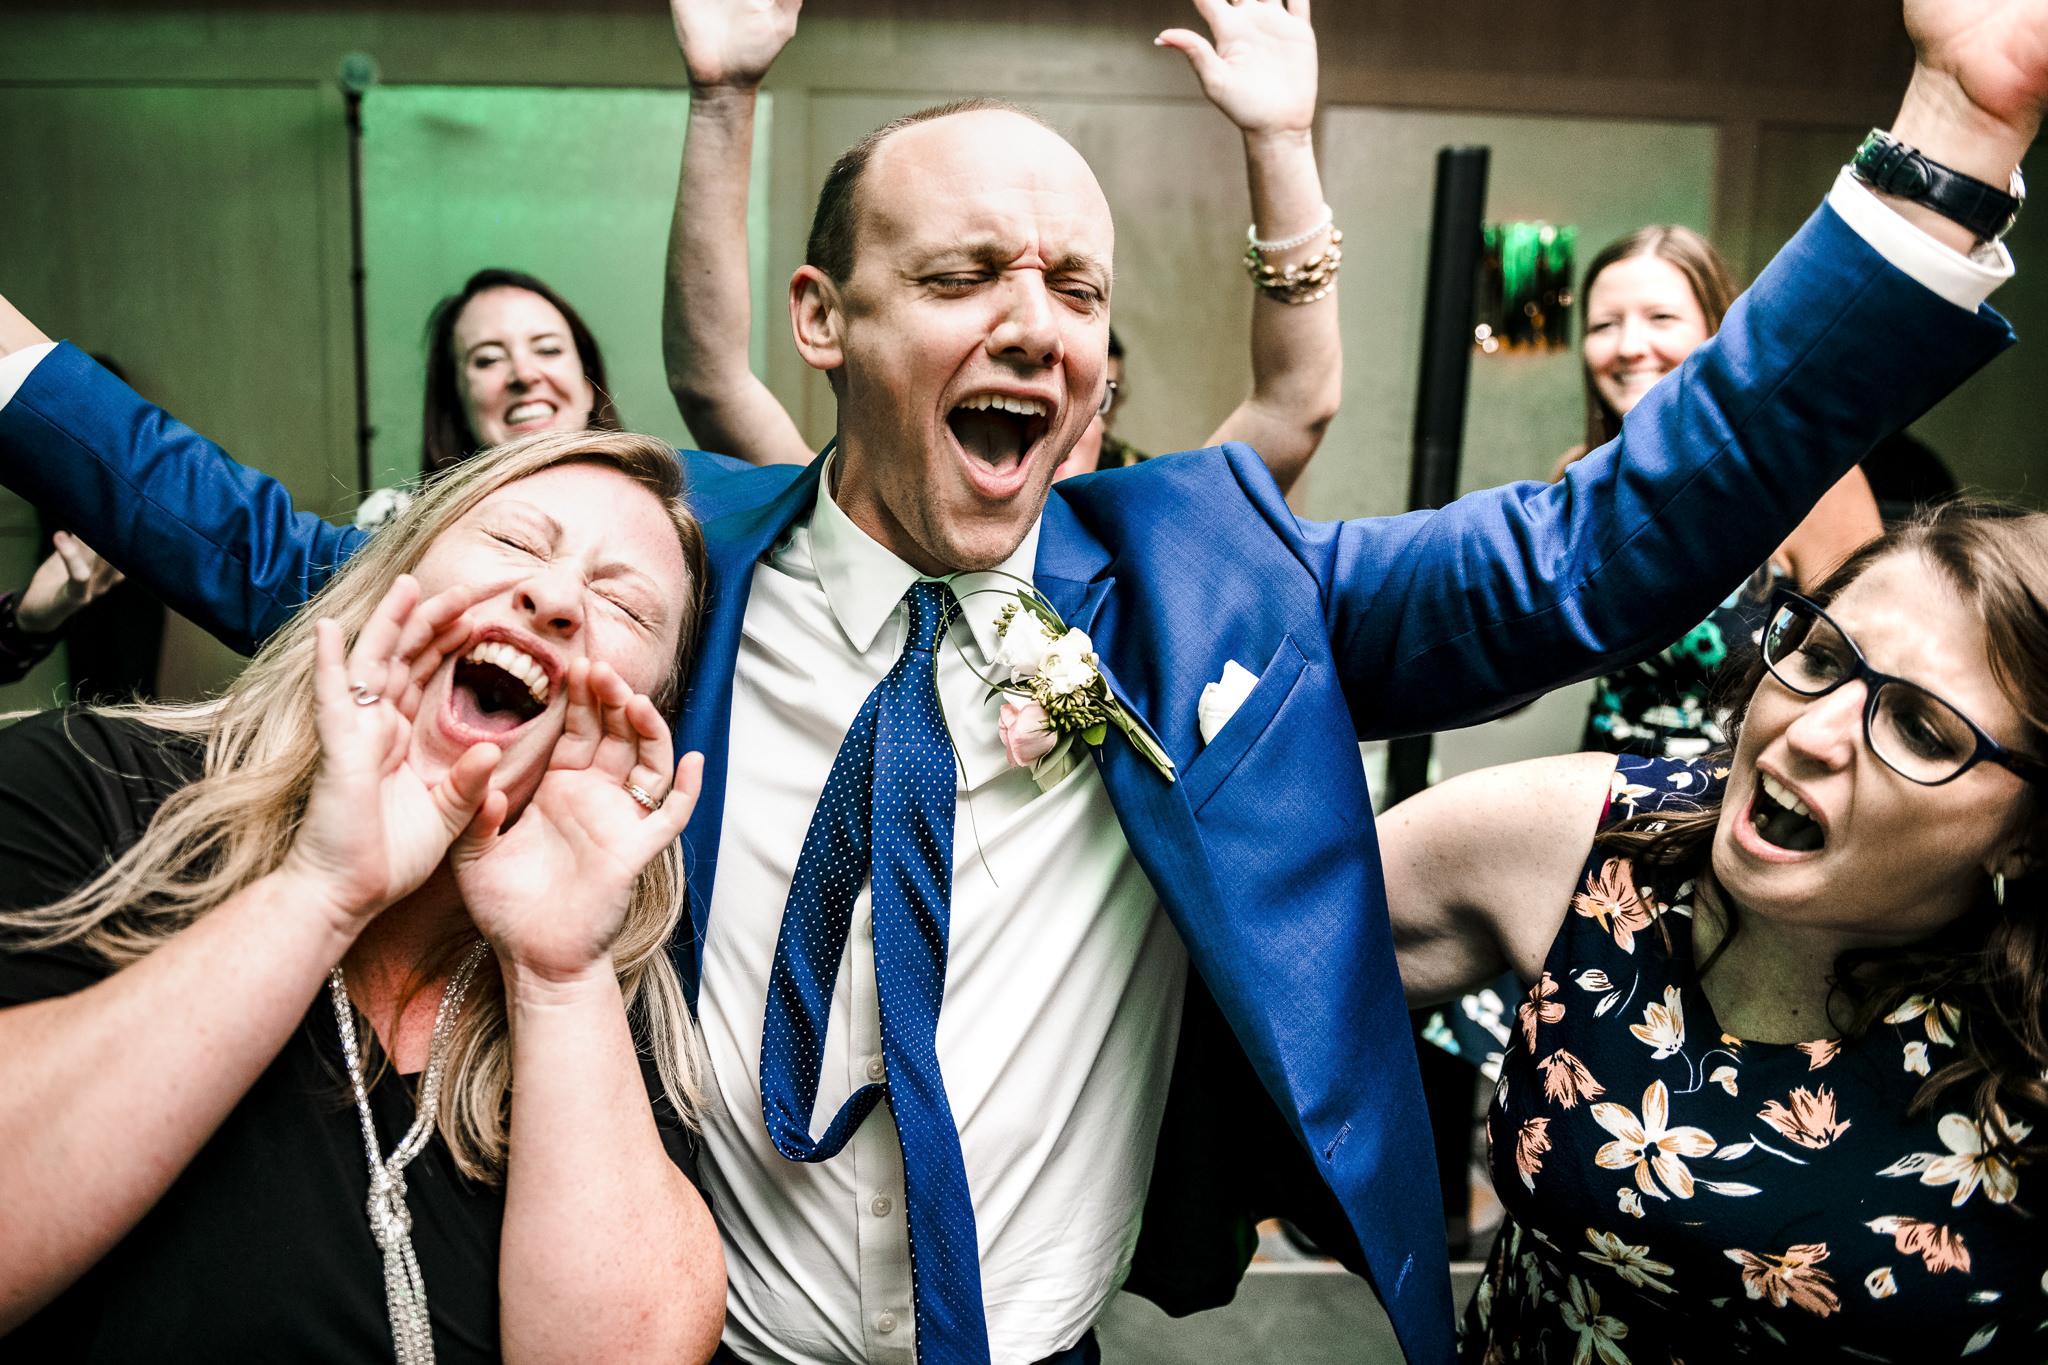 Culos-Sheraton-Eatontown-Long-Branch-Wedding-Photographer-30.JPG